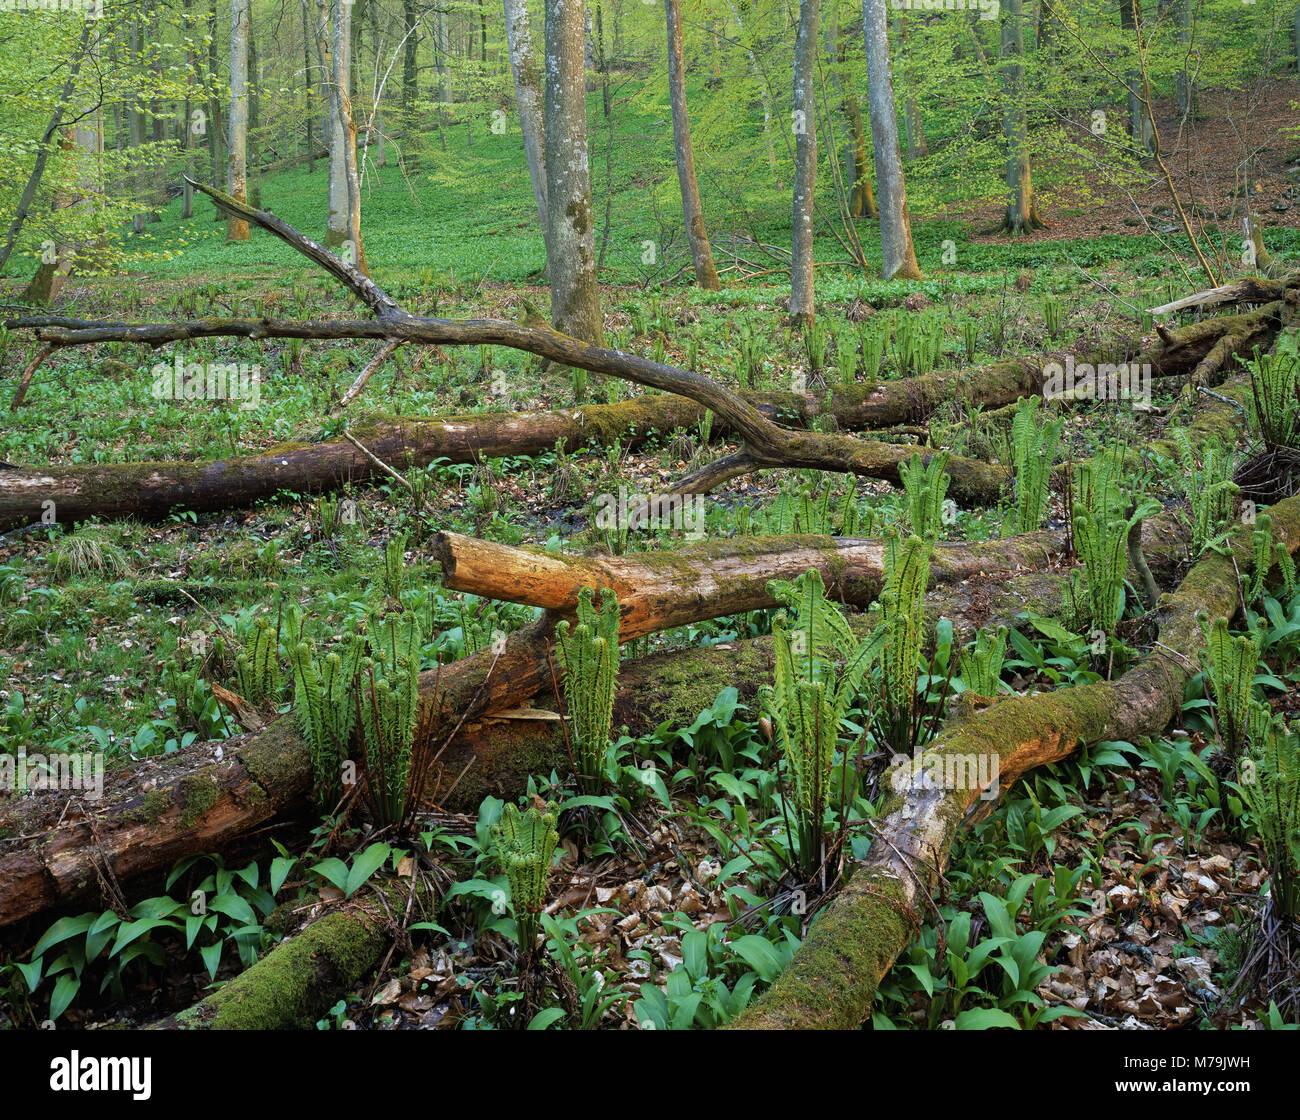 Sweden, Skane, Maltesholm, beech forest, Scandinavia, scenery, nature, wood, ecosystem, spring awakening, trees, - Stock Image